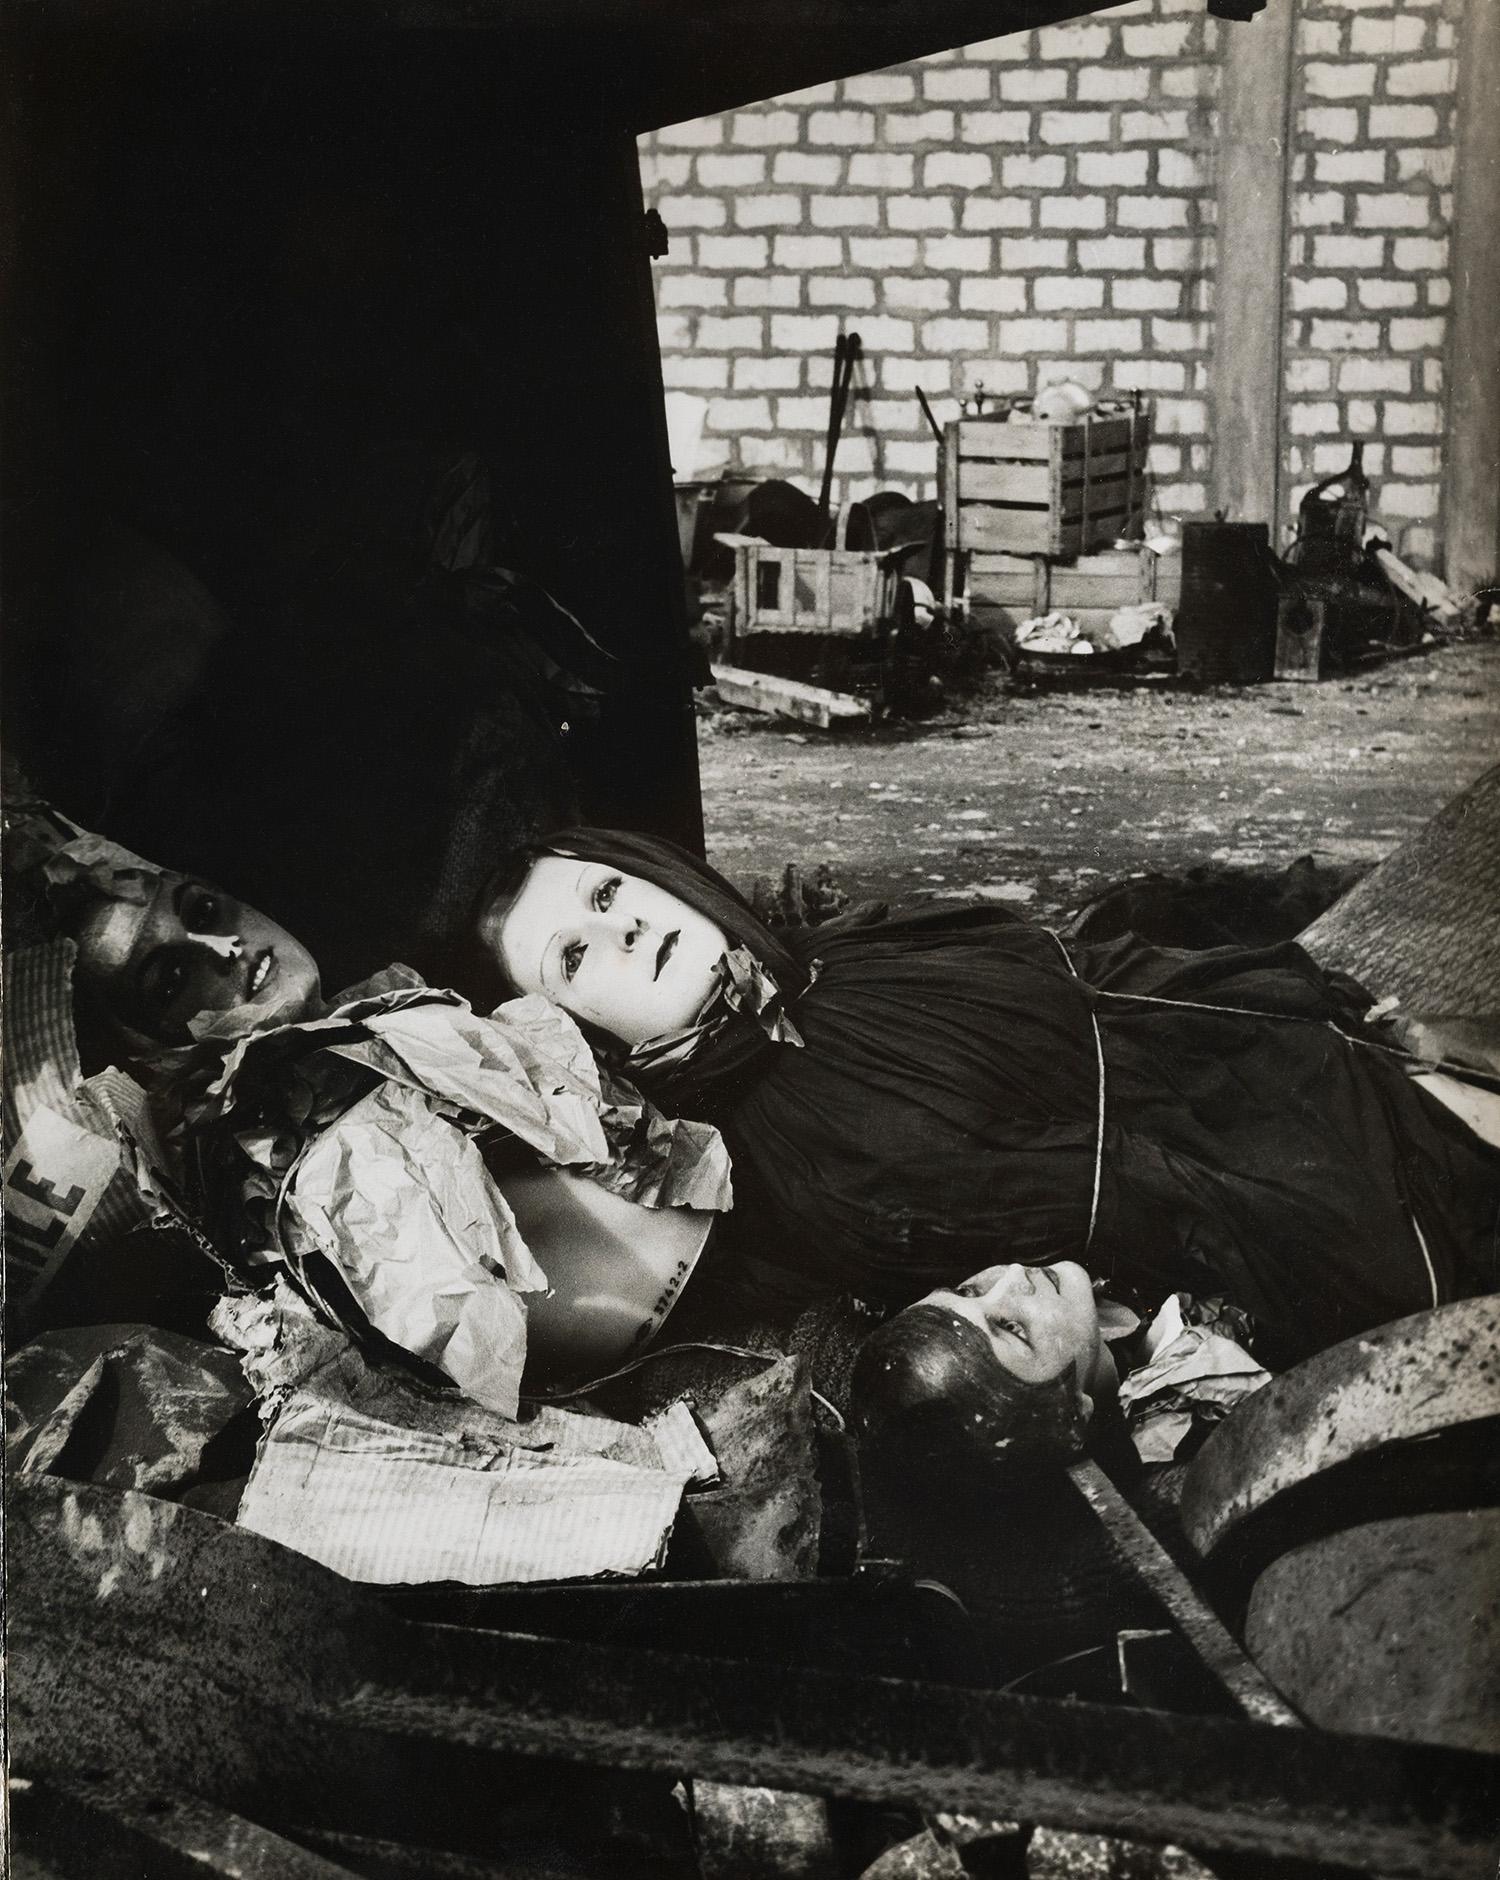 Lucien Clergue,  The Rag-picker's Mannequins , Arles, 1956. Courtesy of the Atelier Lucien Clergue. Courtesy of the Atelier Lucien Clergue and Saif 2019.